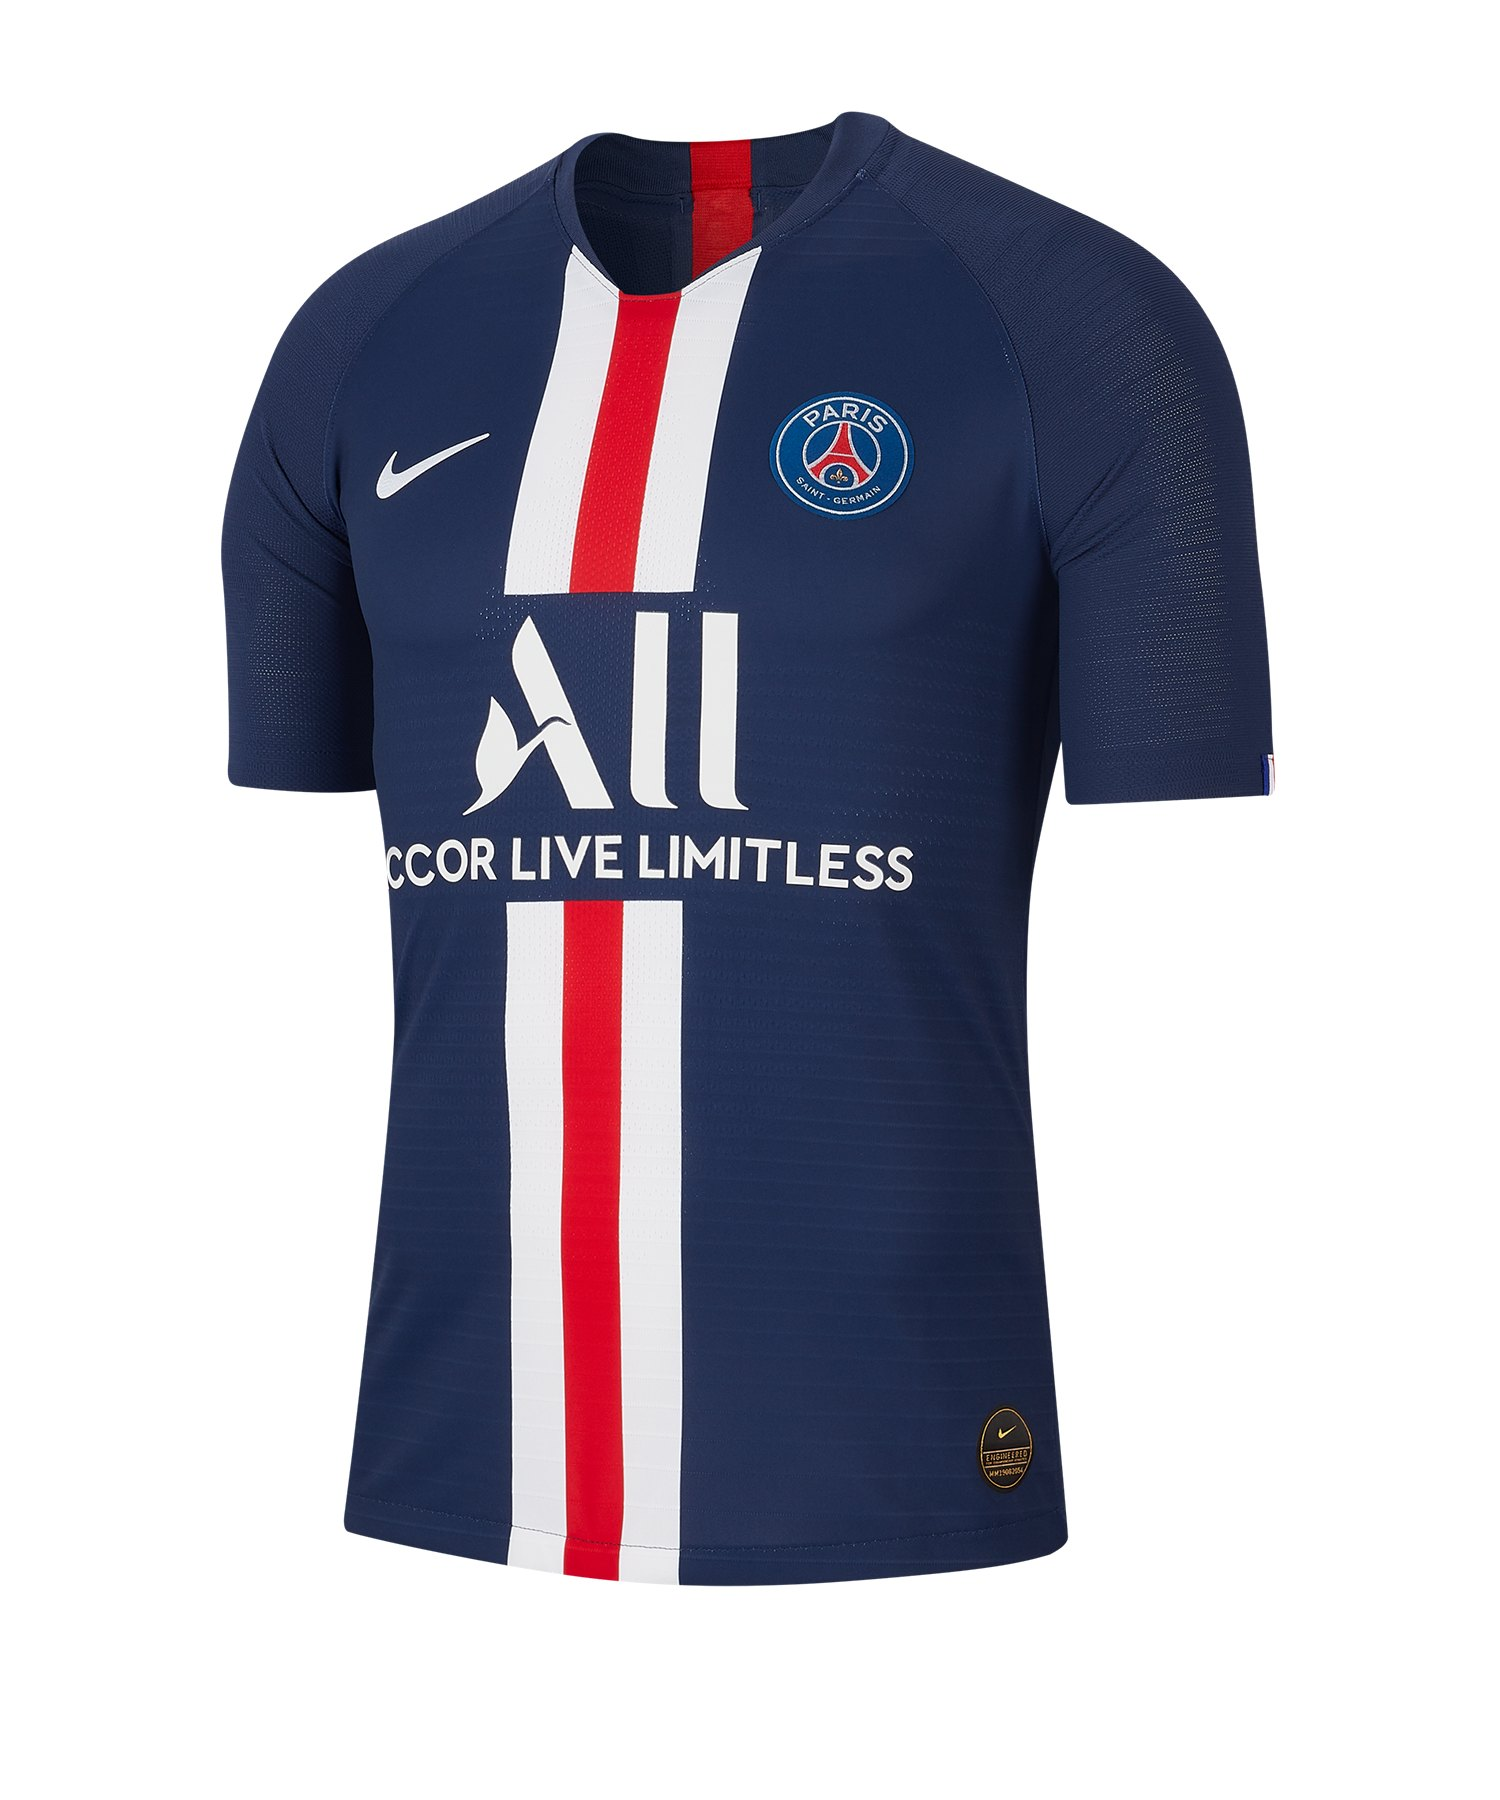 Nike Paris St. Germain Auth Trikot Home 19/20 F411 - blau